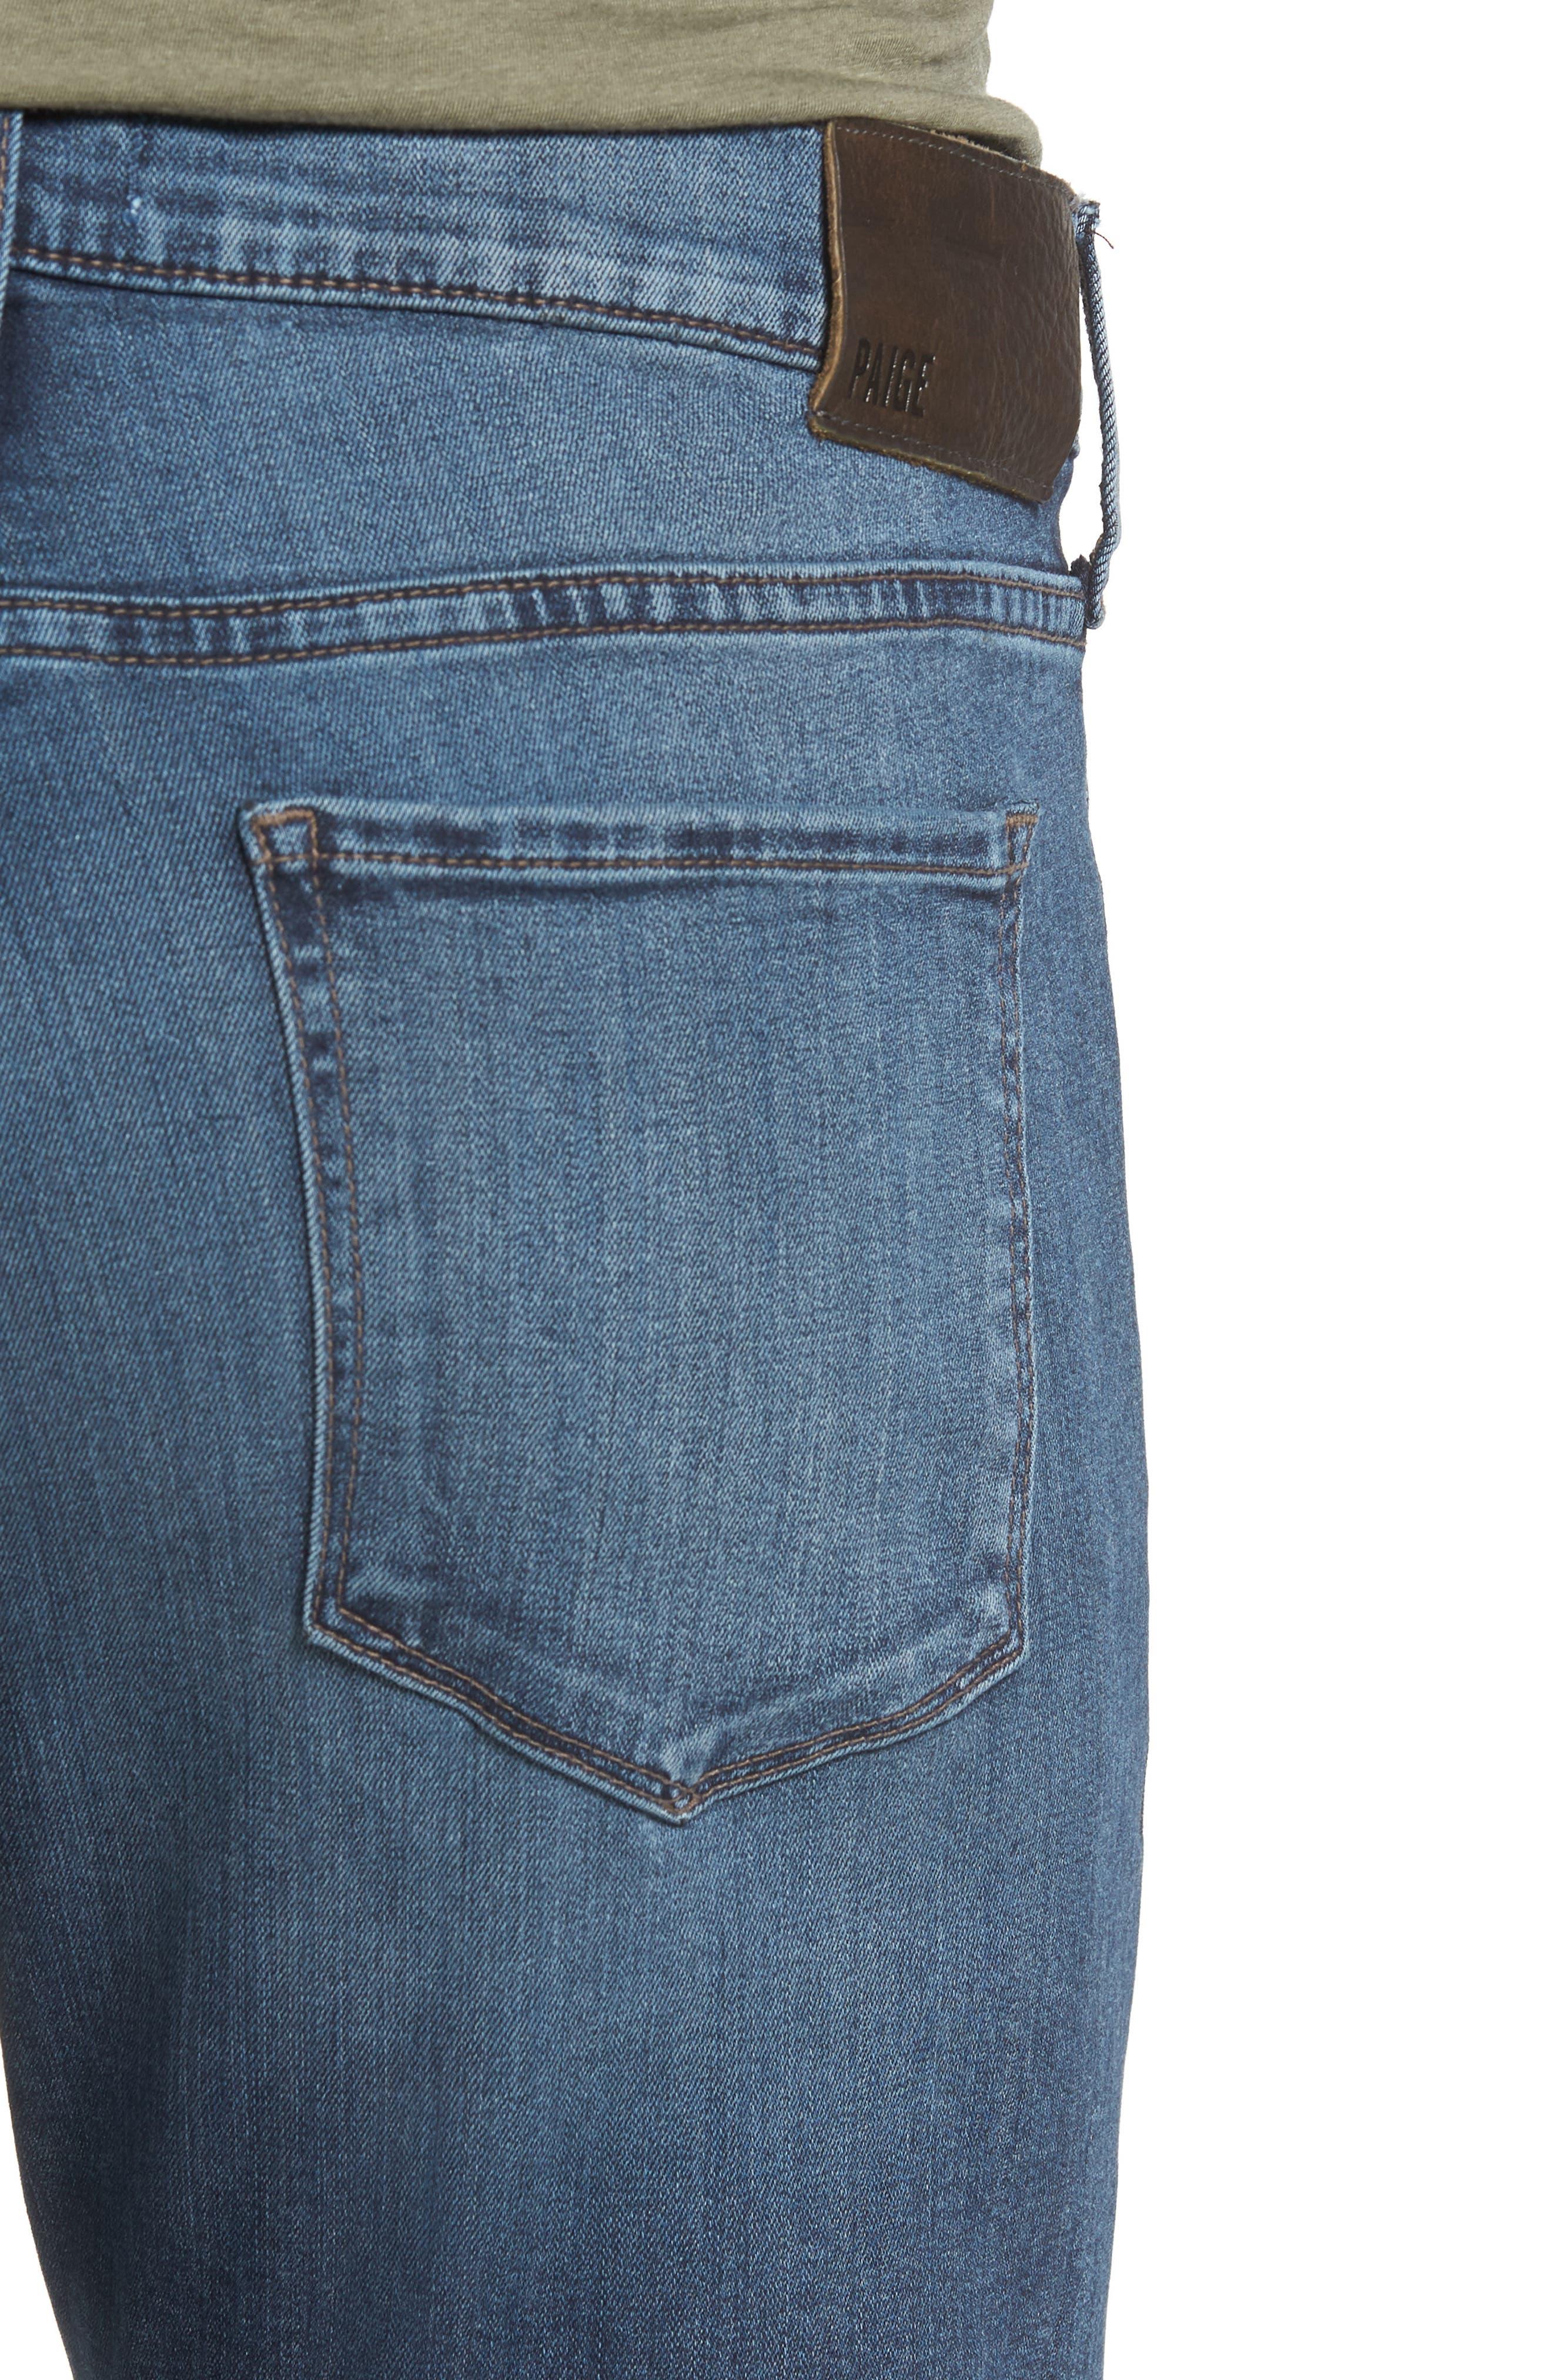 Transcend - Lennox Slim Fit Jeans,                             Alternate thumbnail 4, color,                             GRAMMERCY